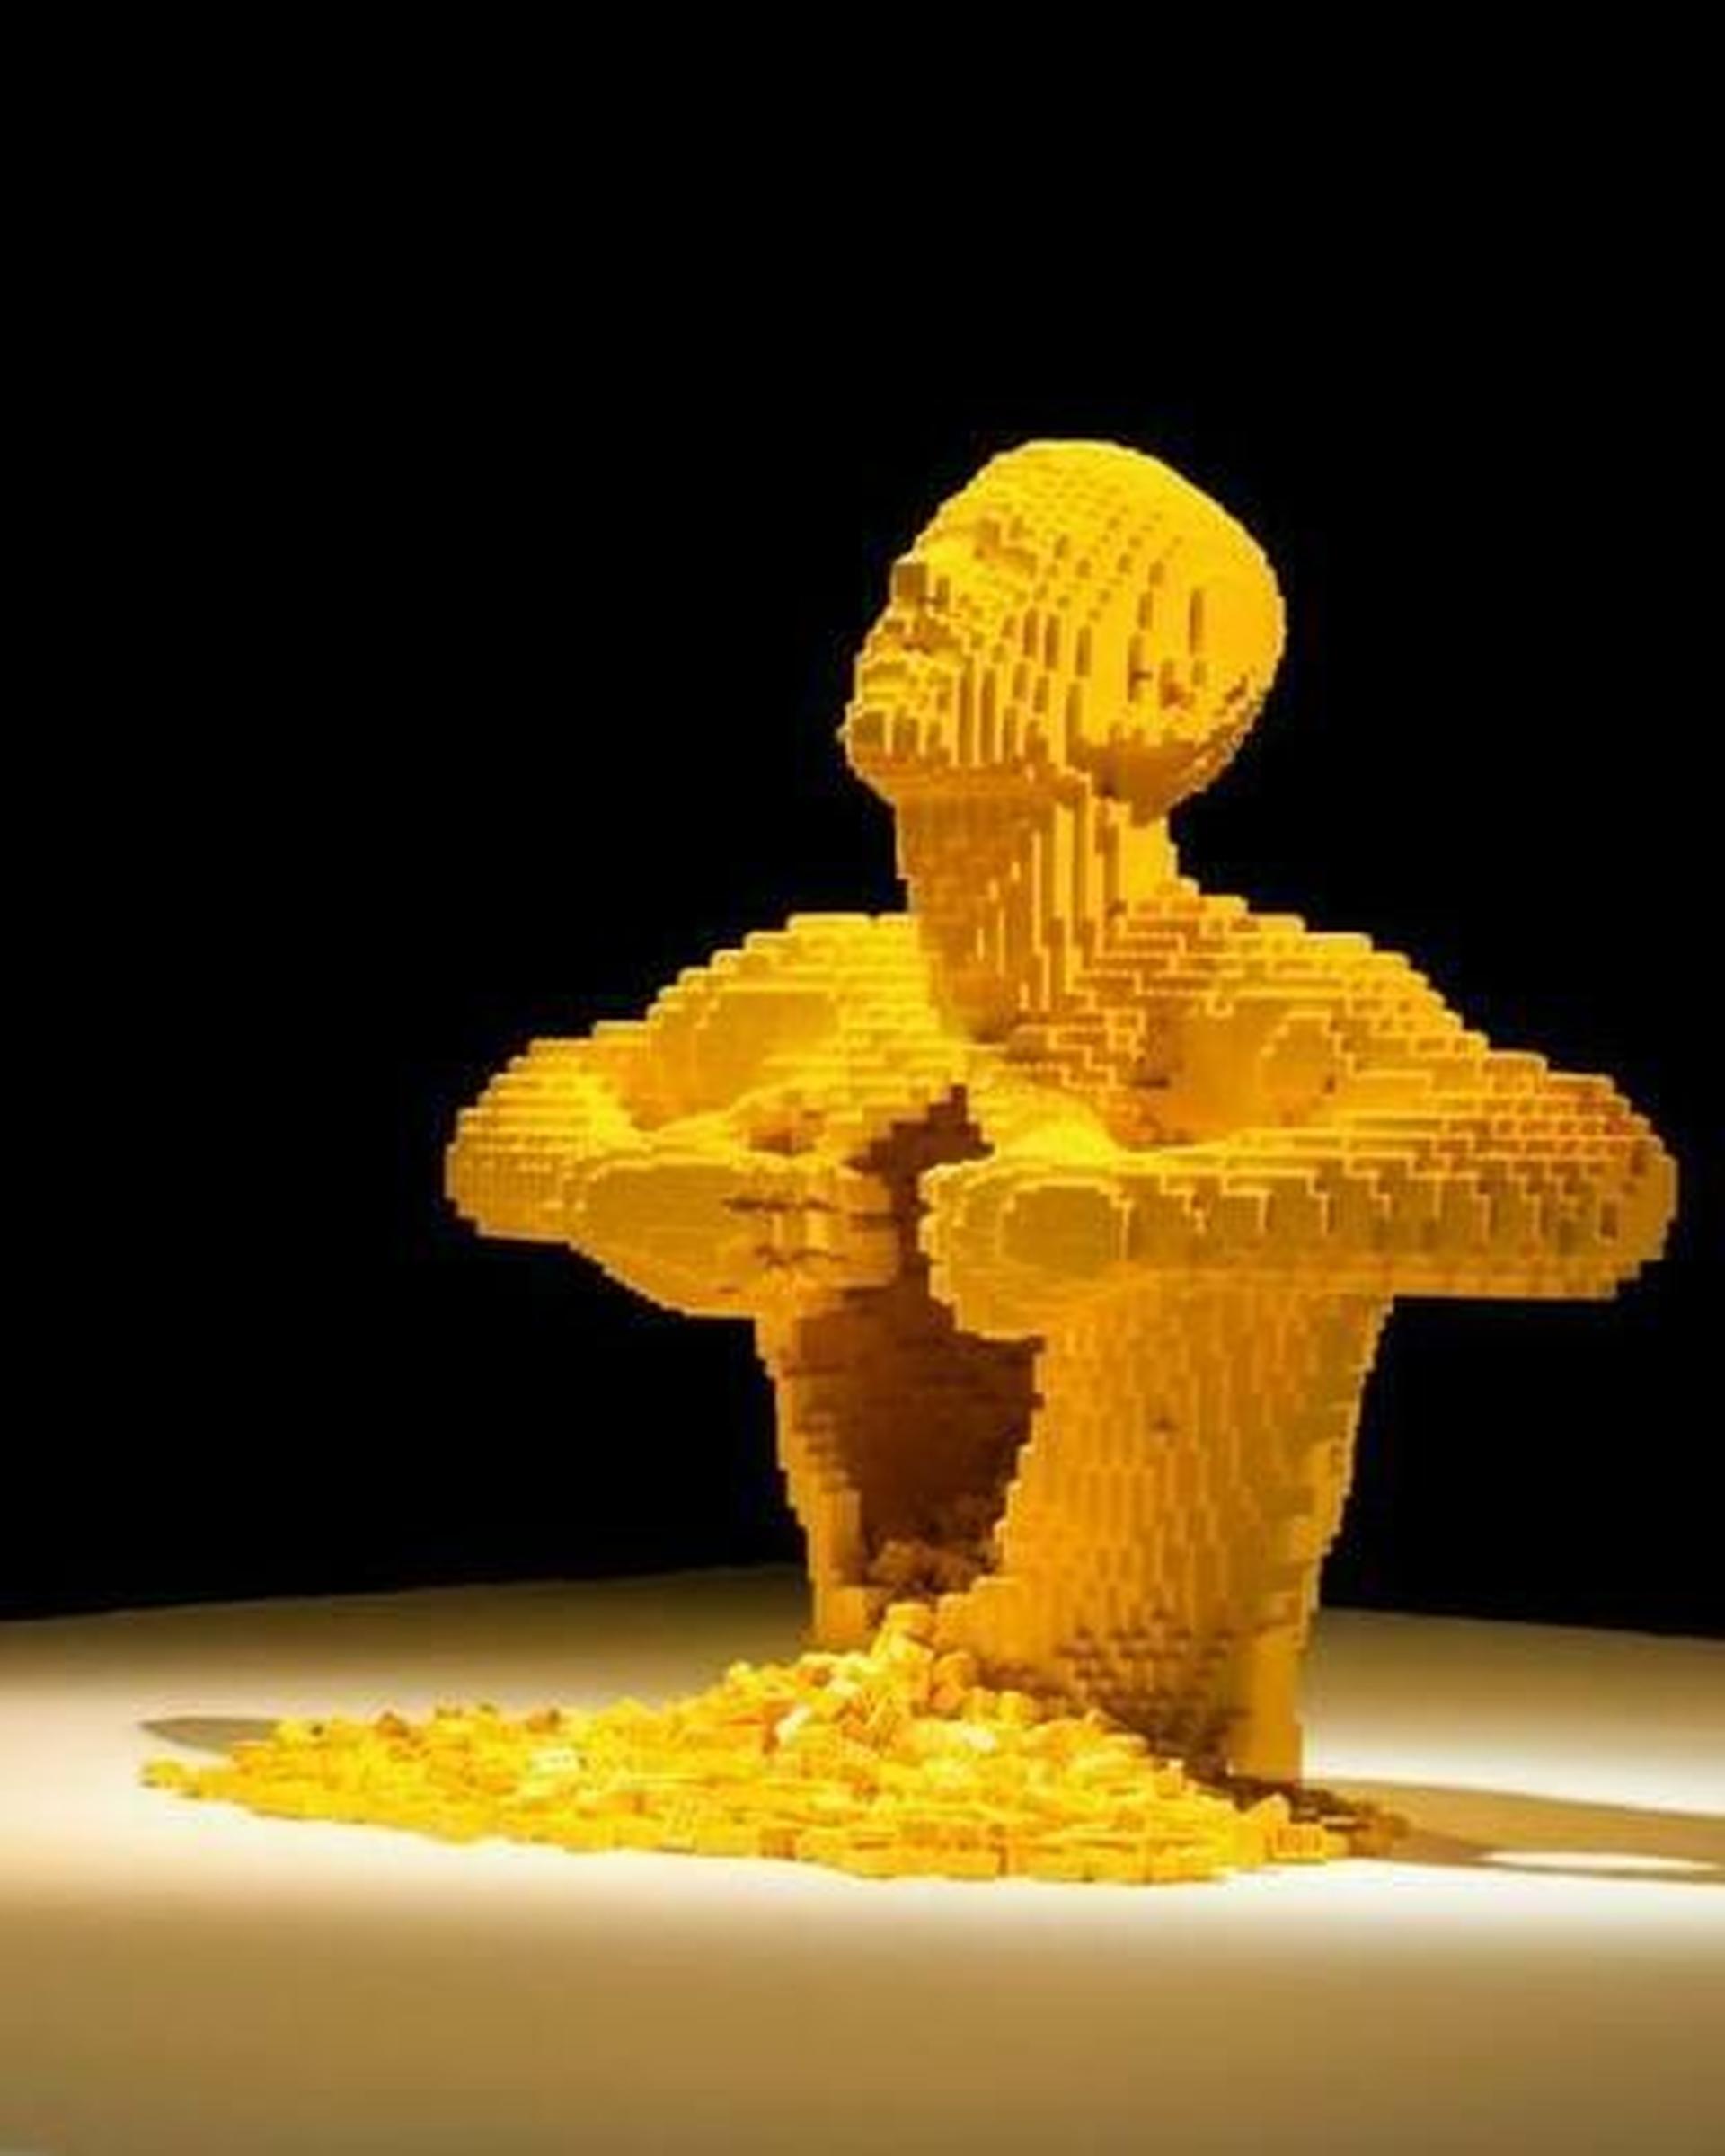 The art of the brick. צילום באדיבות הדרן ייזמות והפקות